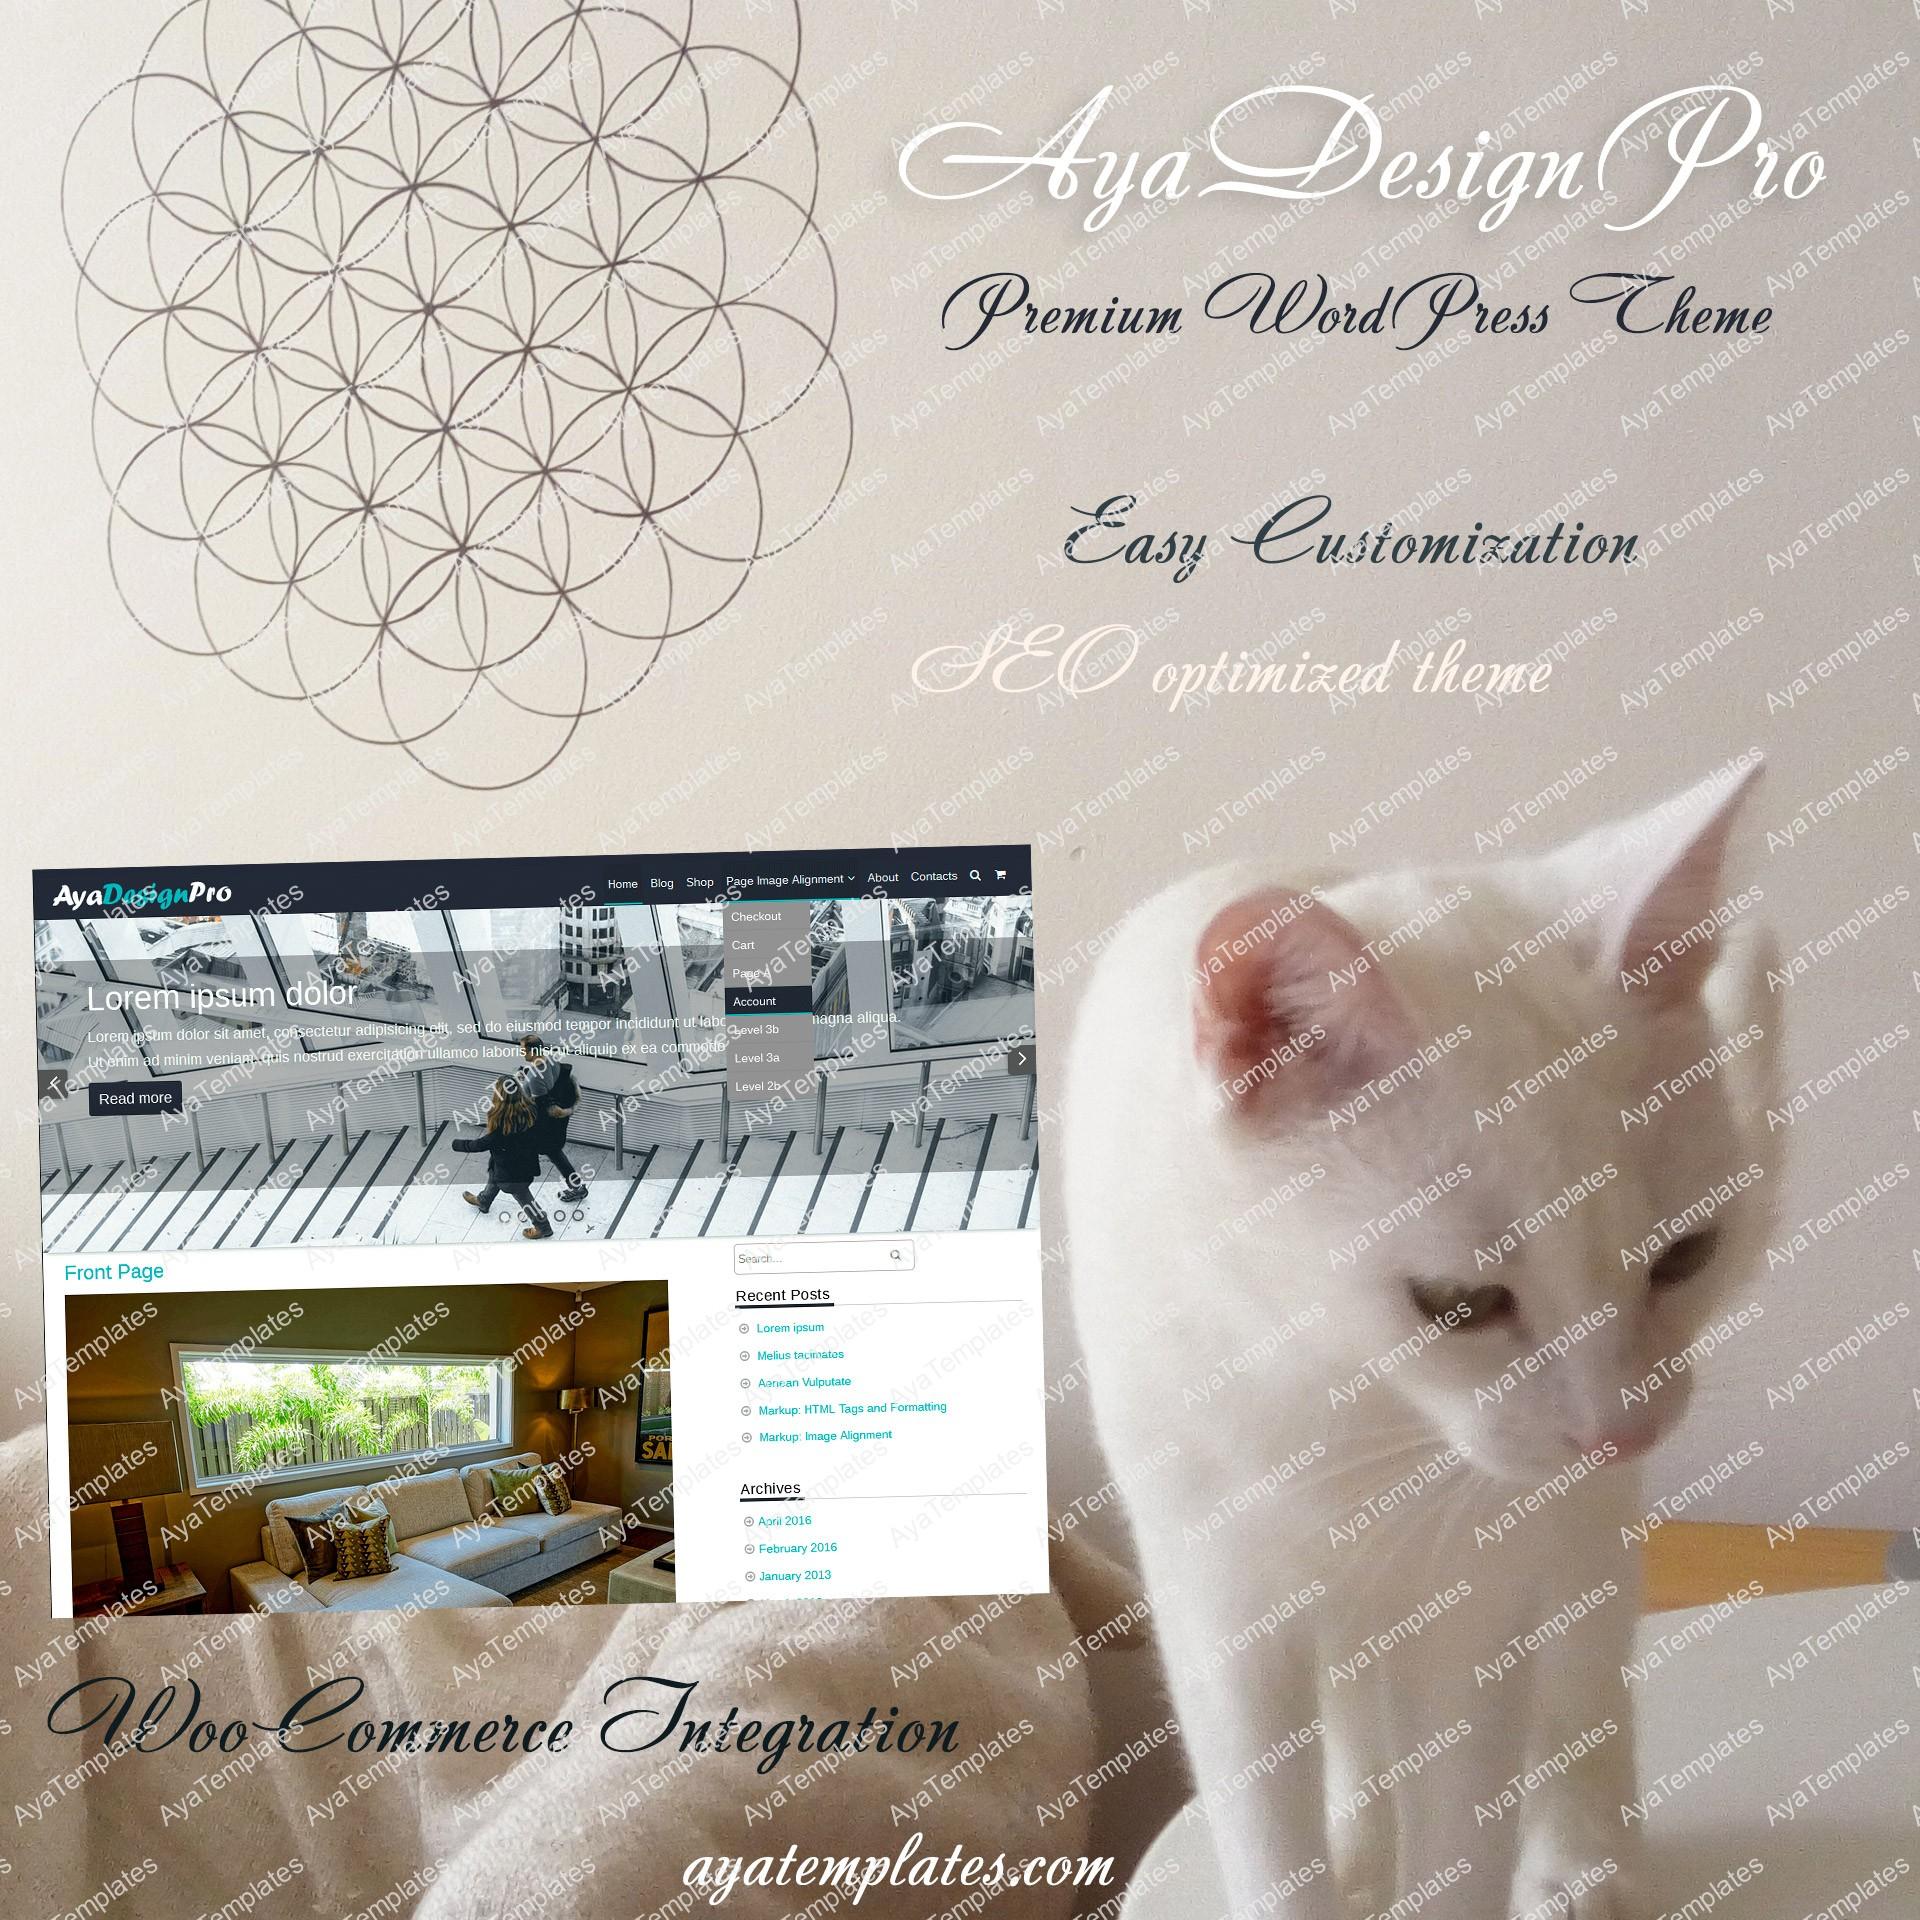 ayadesignpro-premium-wordpress-theme-mockup-ayatemplates-com